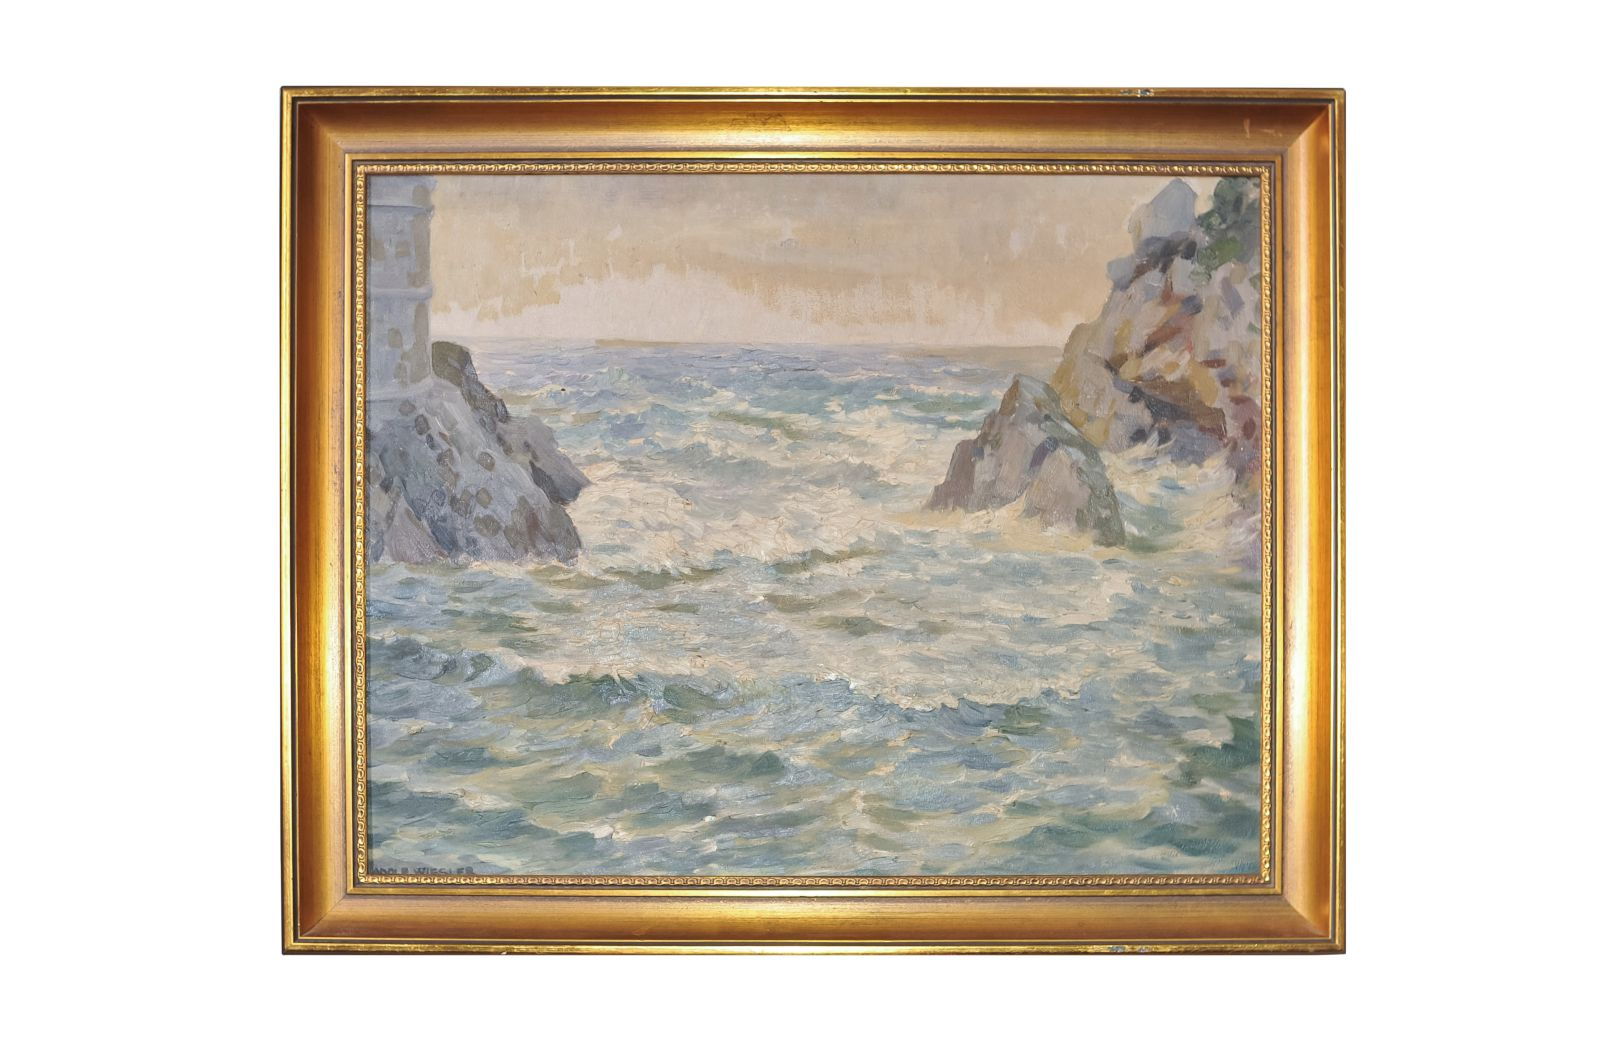 #117 Adolf Wiesler (1878-1958) Image